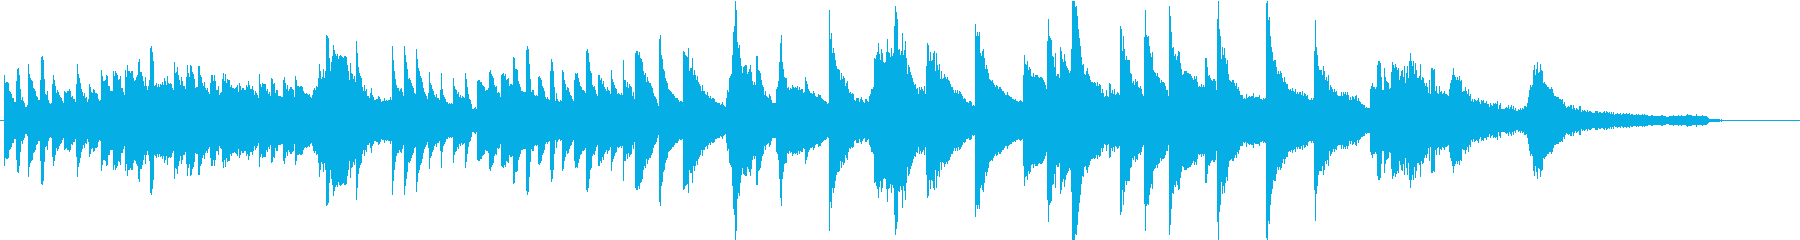 CM・企業VP等に透明感のあるピアノソロの再生済みの波形